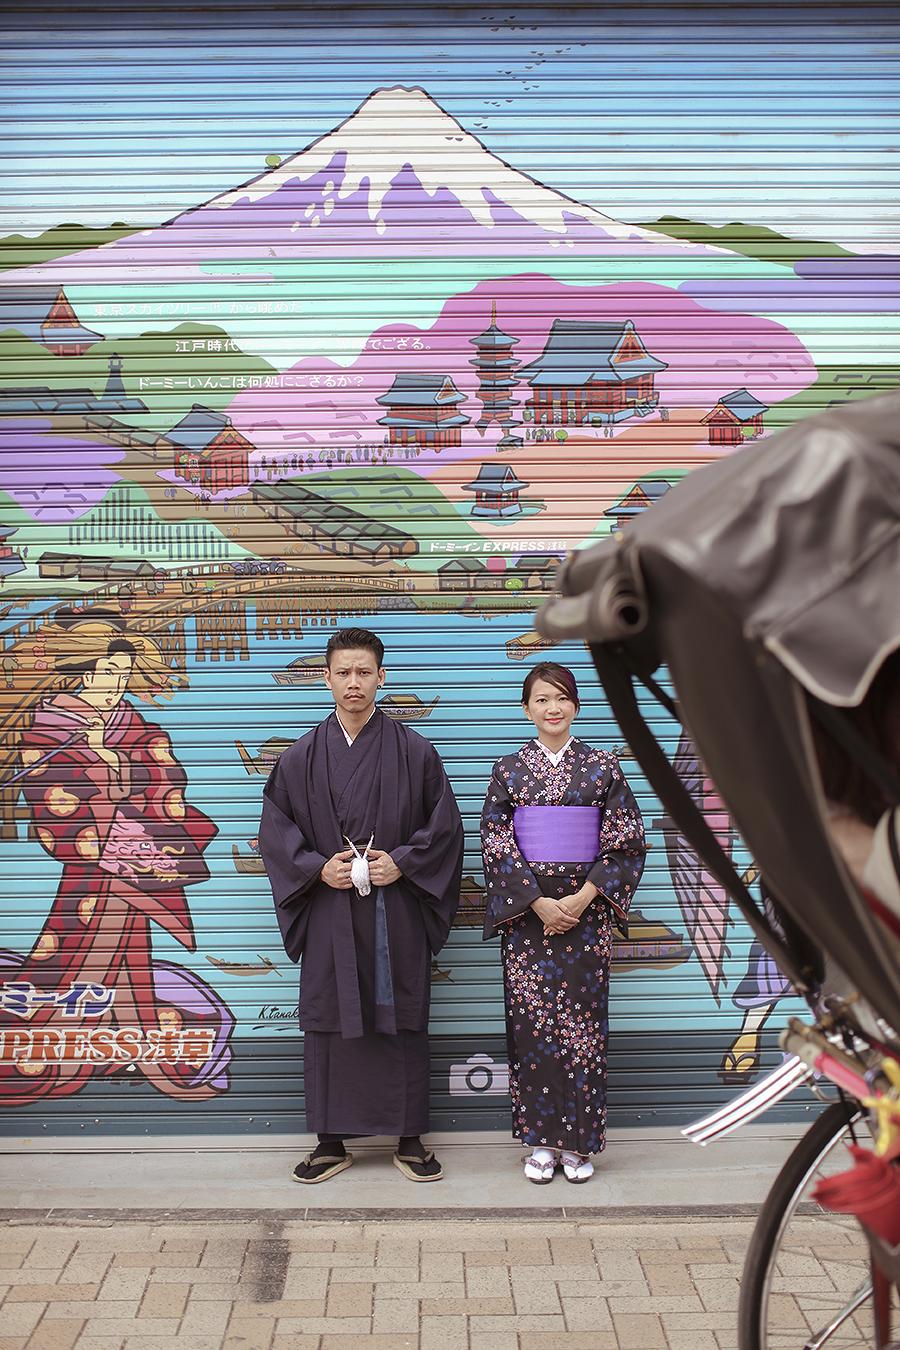 tokyo hakone japan spring sakura . engagement wedding photography by kurt ahs . ns + eu . 0418.jpg